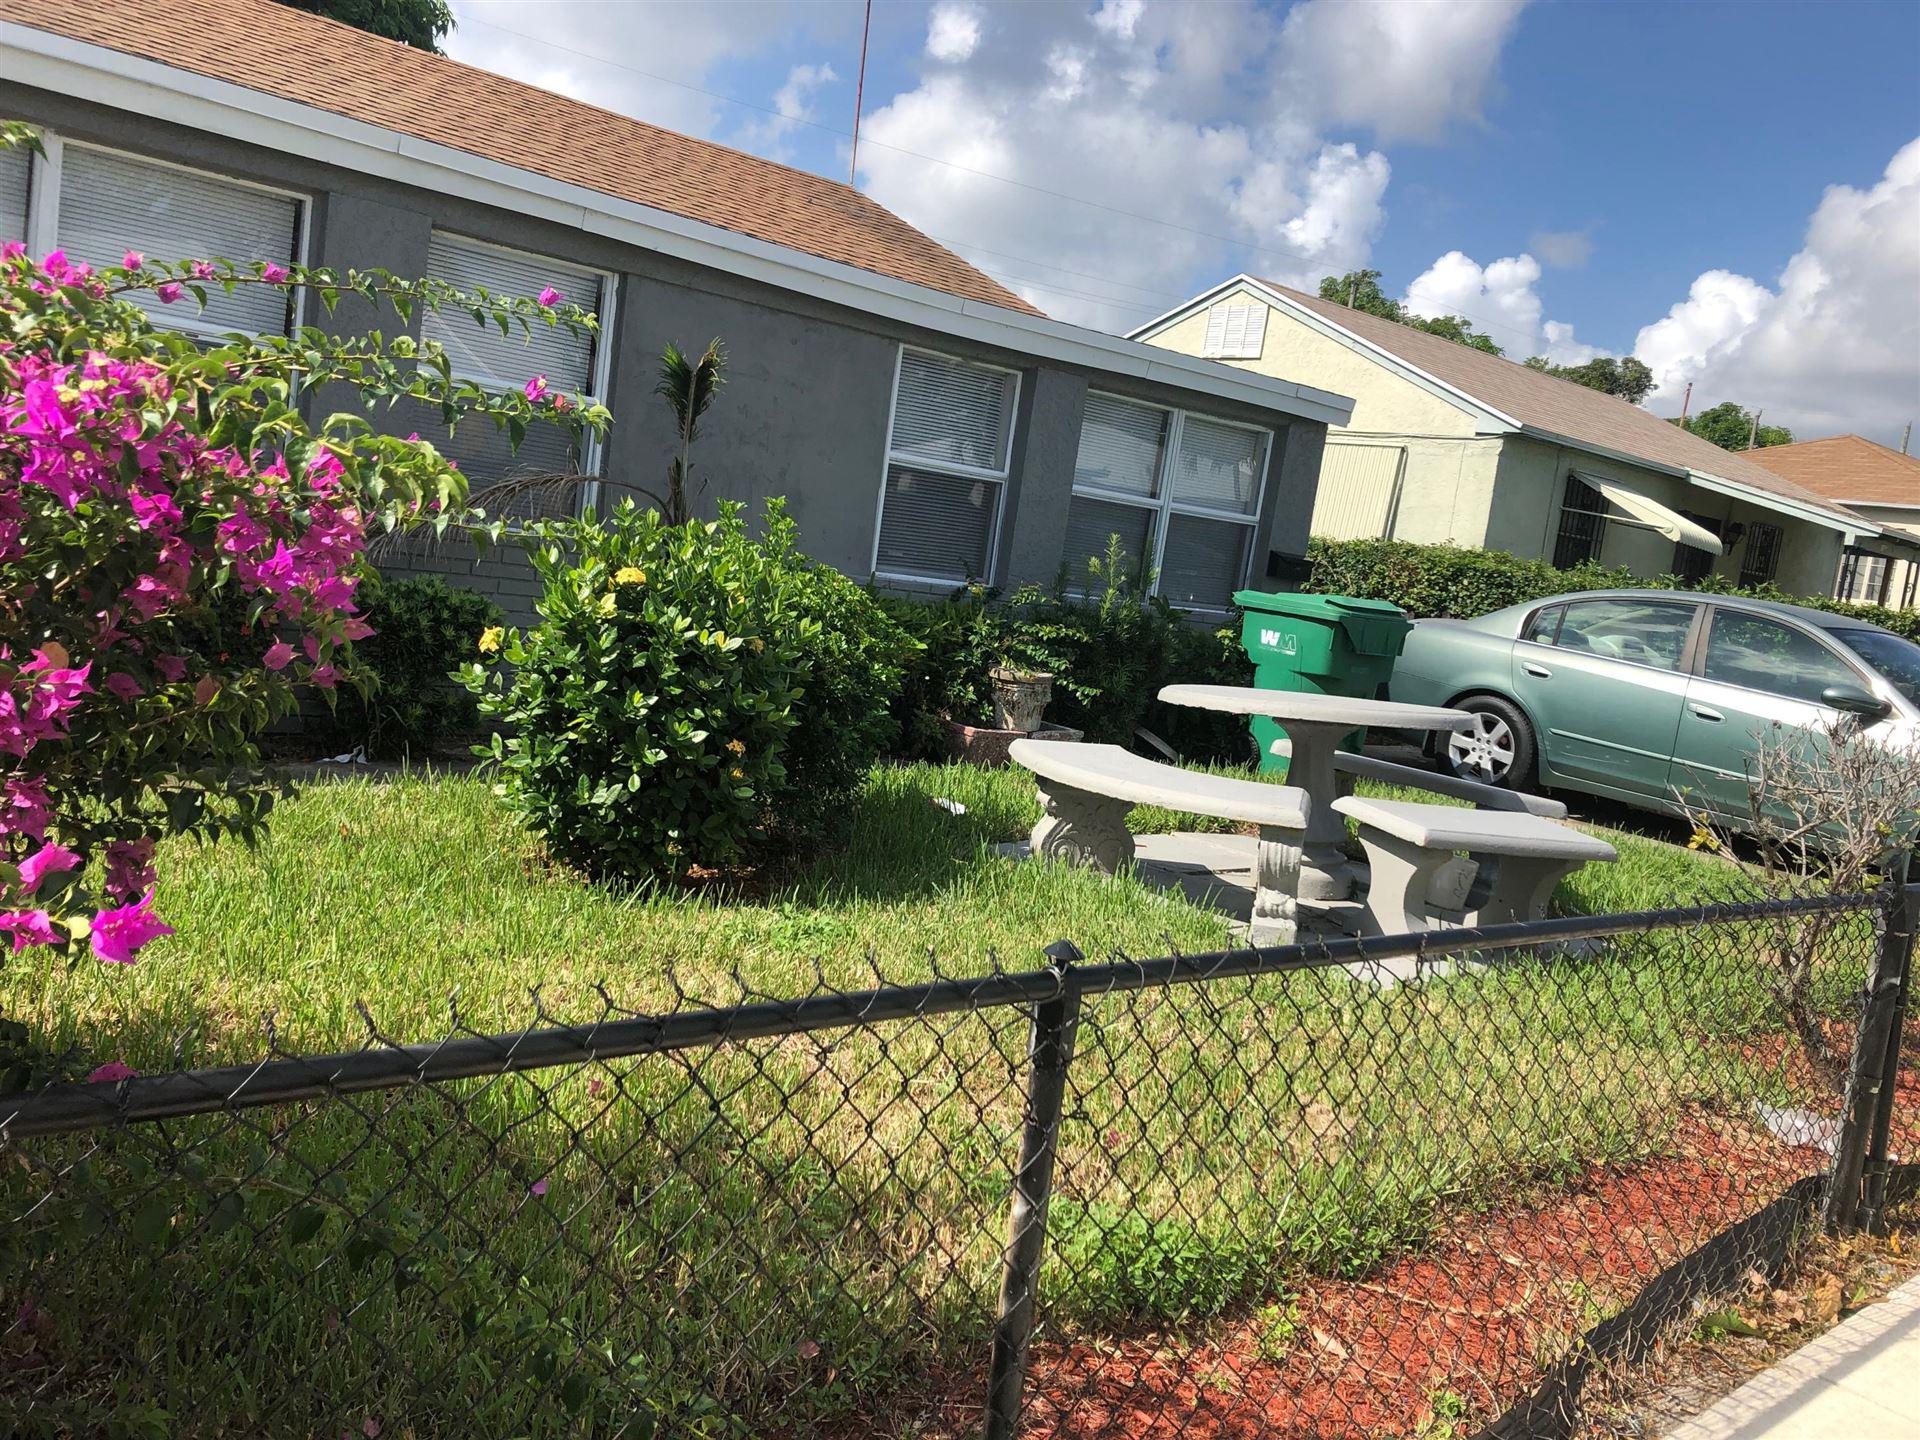 717 W 4th Street, West Palm Beach, FL 33404 - #: RX-10560451